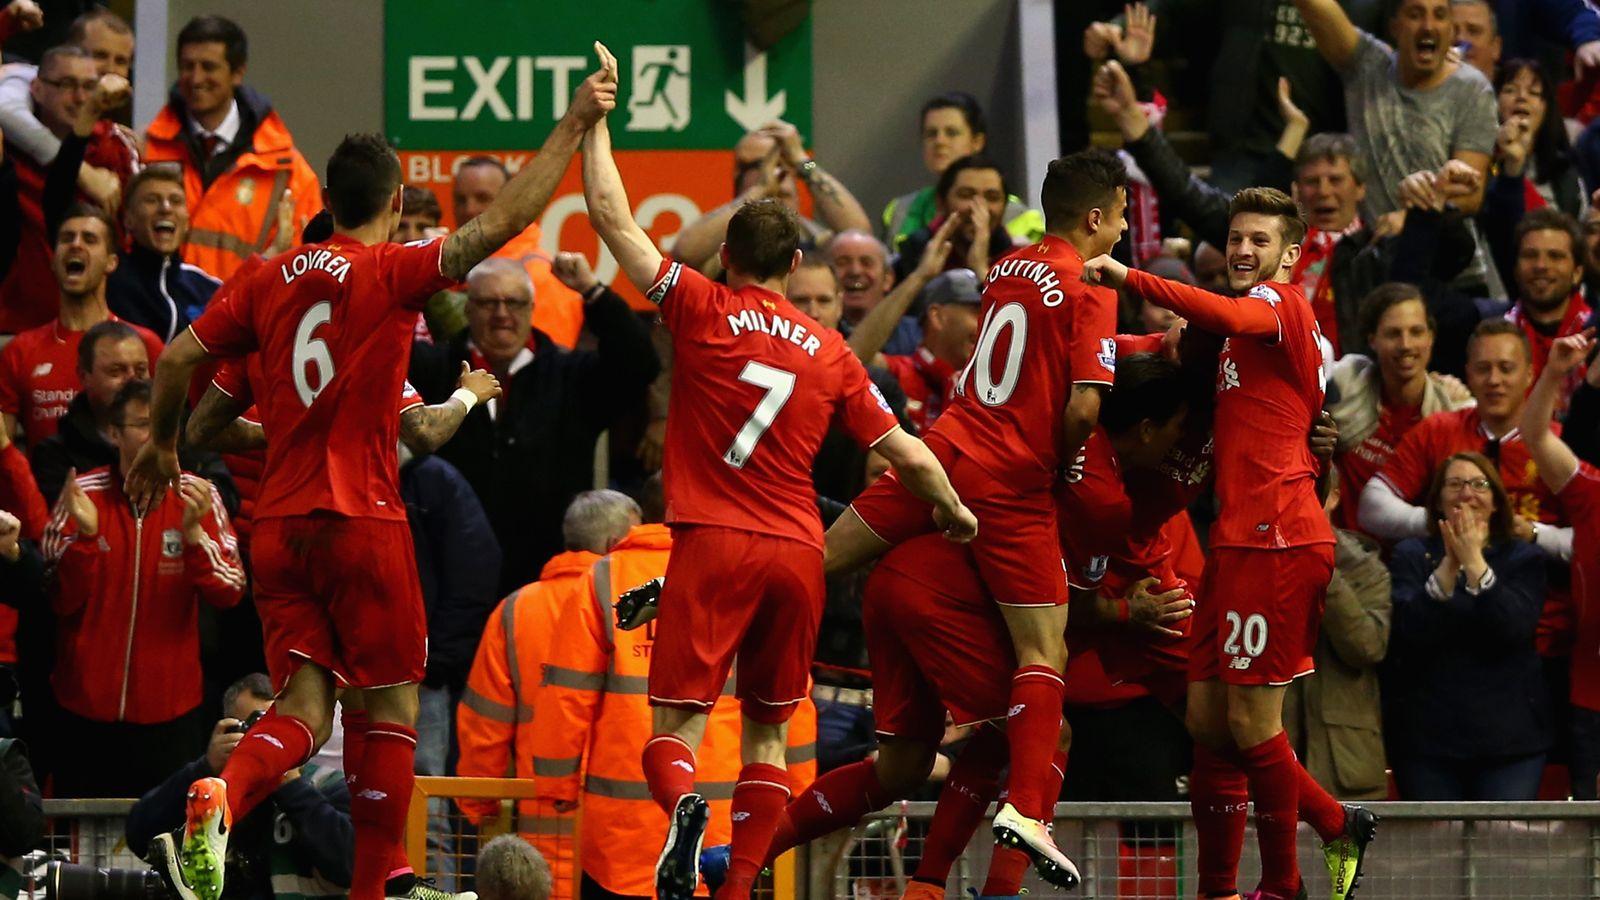 Liverpool 4 - 0 Everton - Match Report & Highlights